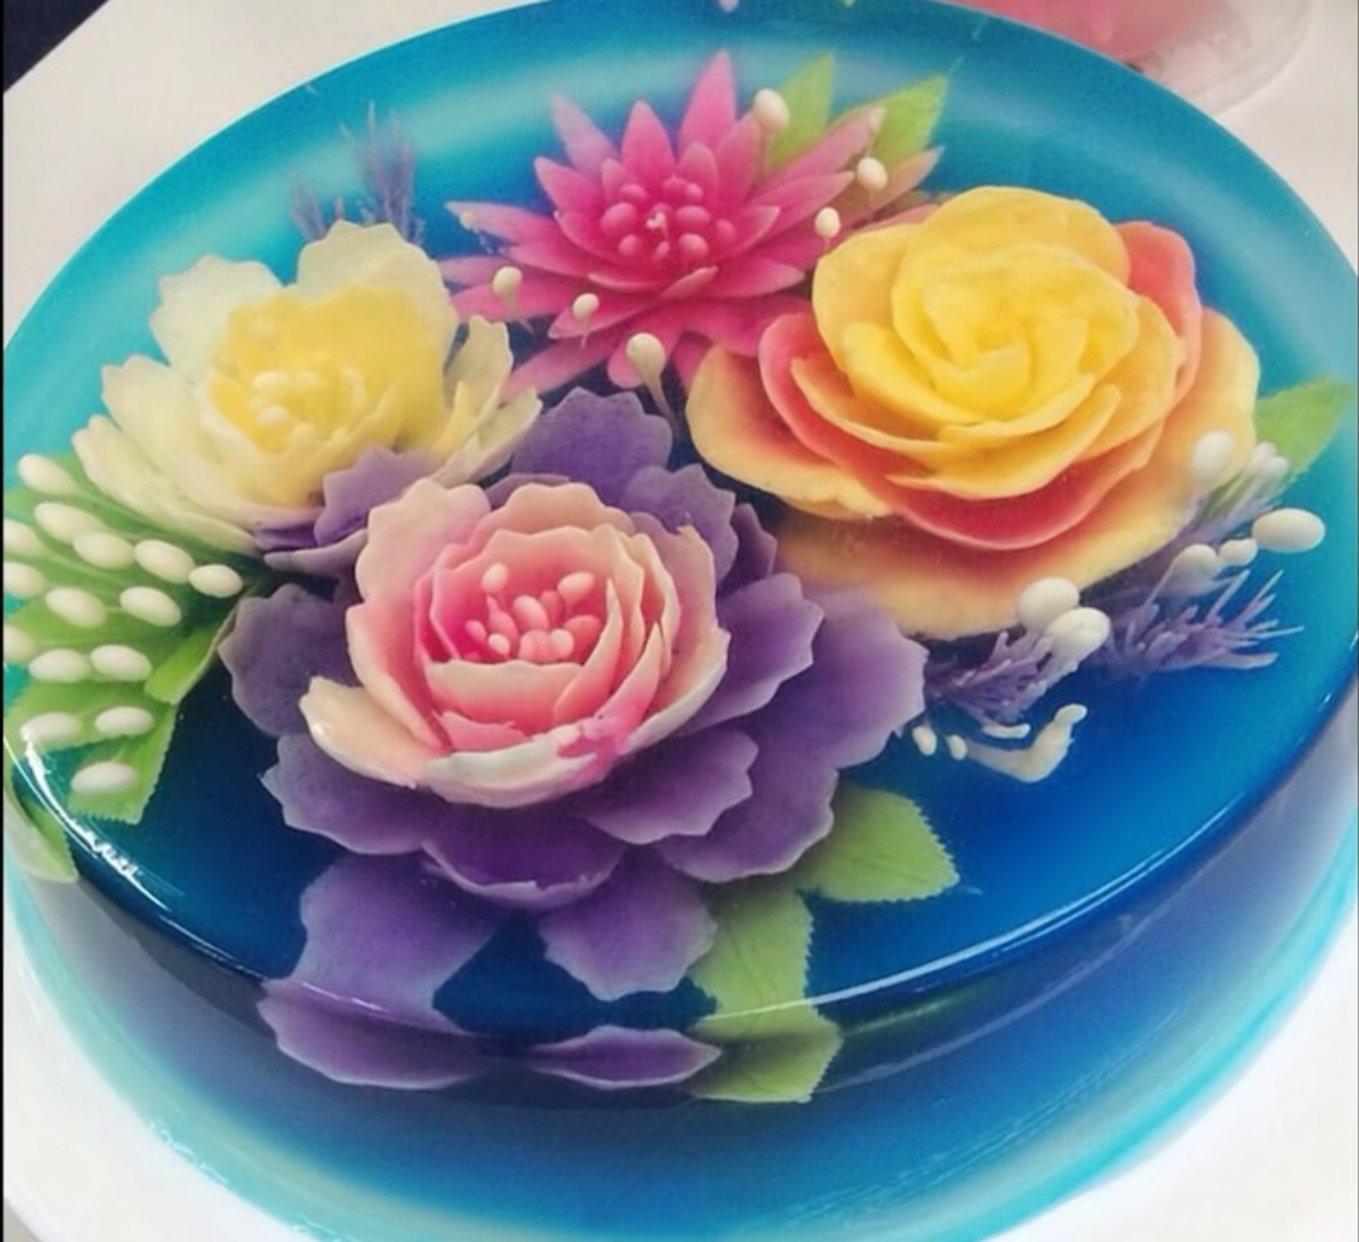 JJMG 3D Jelly Cake Needle Tips 5-Set DIY Gelatin Art Flower Needles Baking Pastry Tool with Syringe Jello Cake Stainless Steel Tips Tools (ABCDE 5 x 10pcs/set = total 50 tips) by JJMG